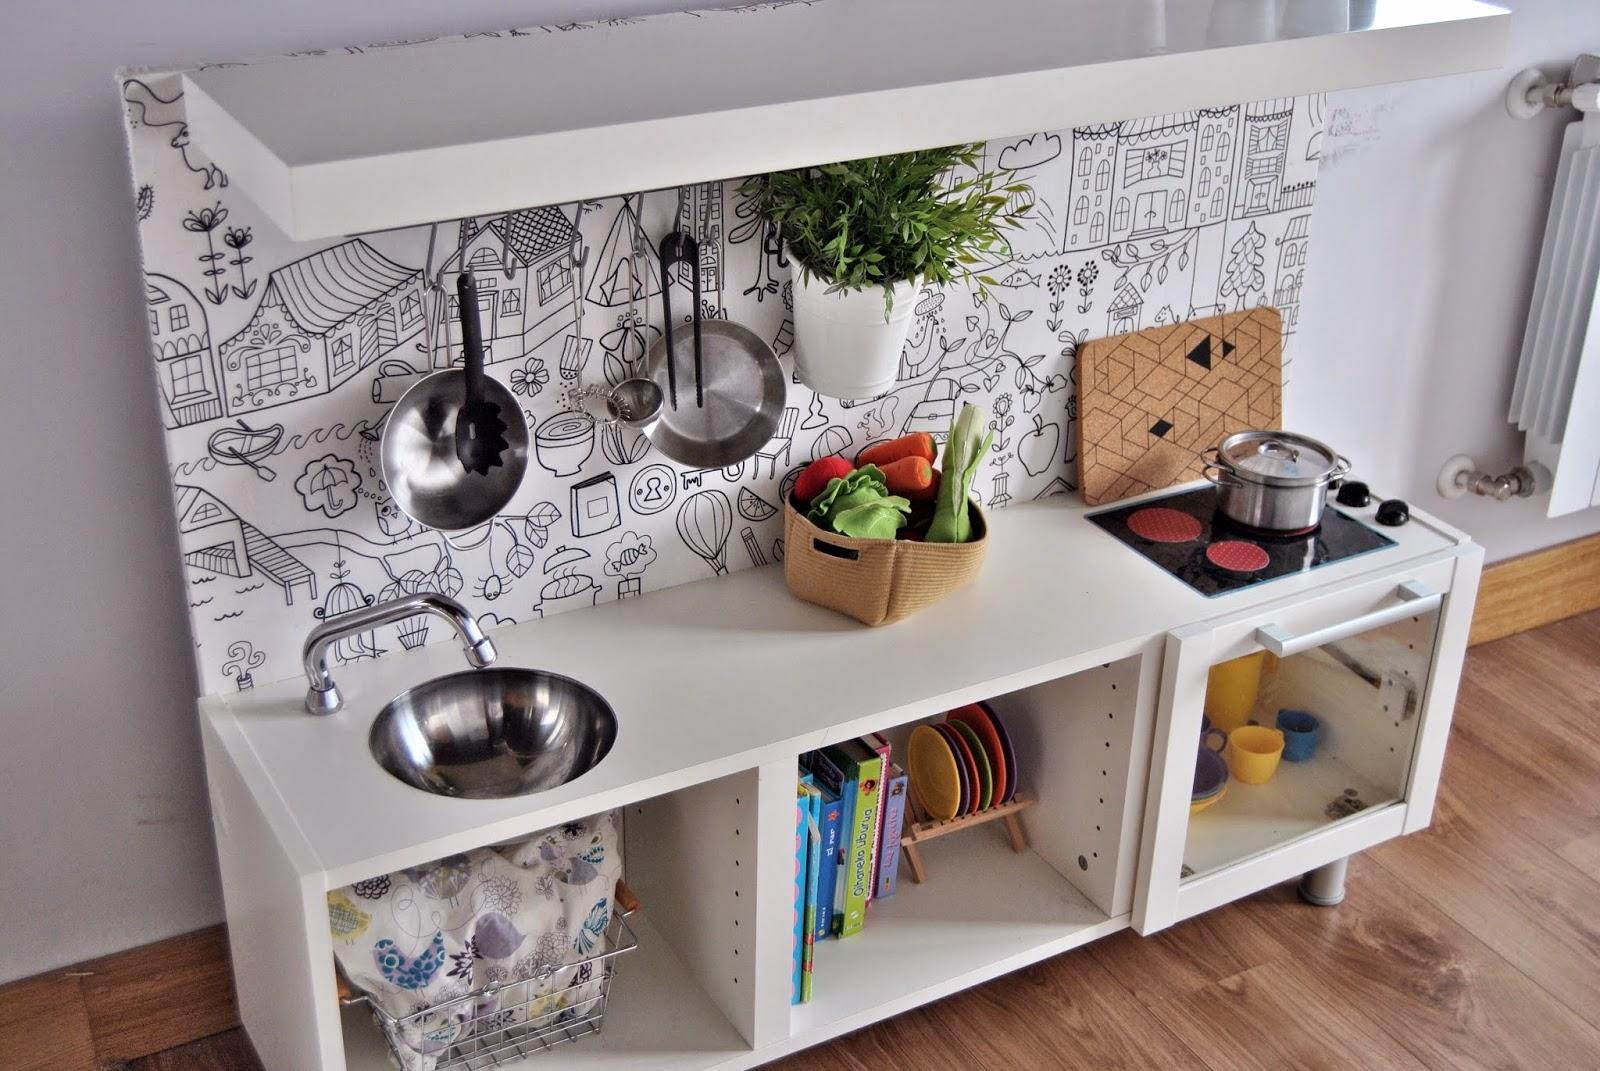 Cocina cocina ikea ni os segunda mano decoraci n de - Decoracion de segunda mano ...